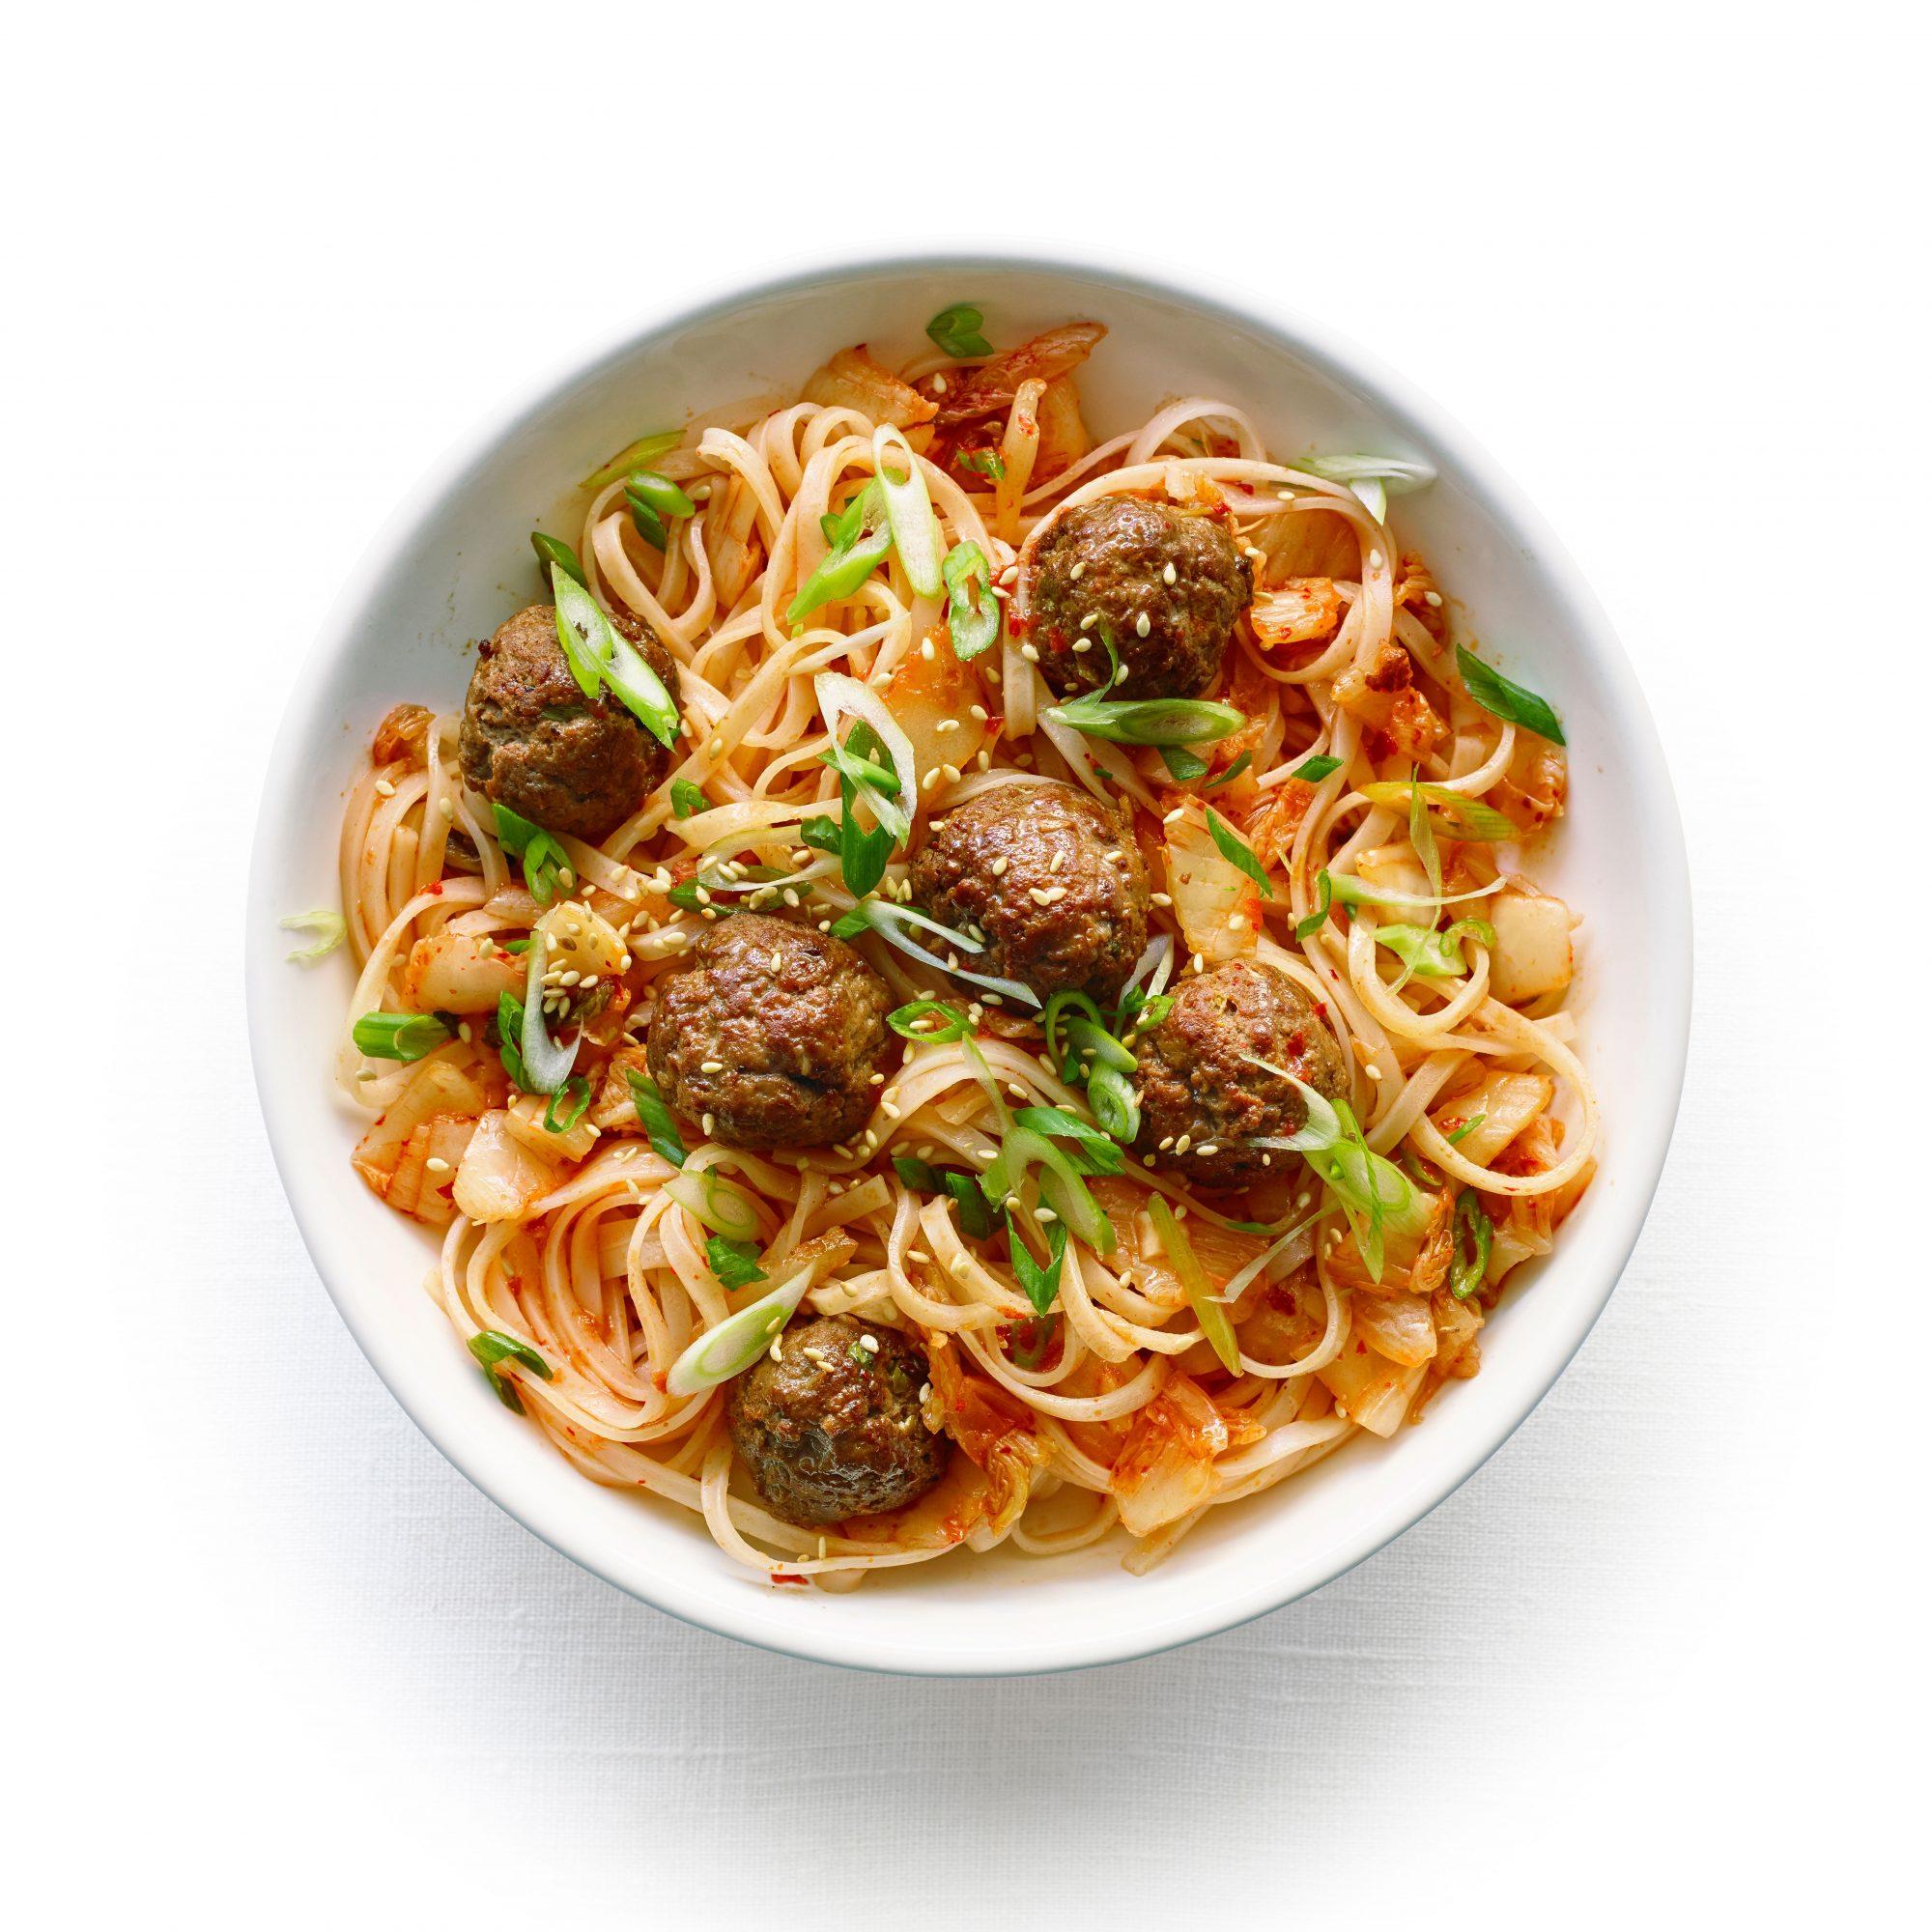 Korean Spaghetti and Meatballs